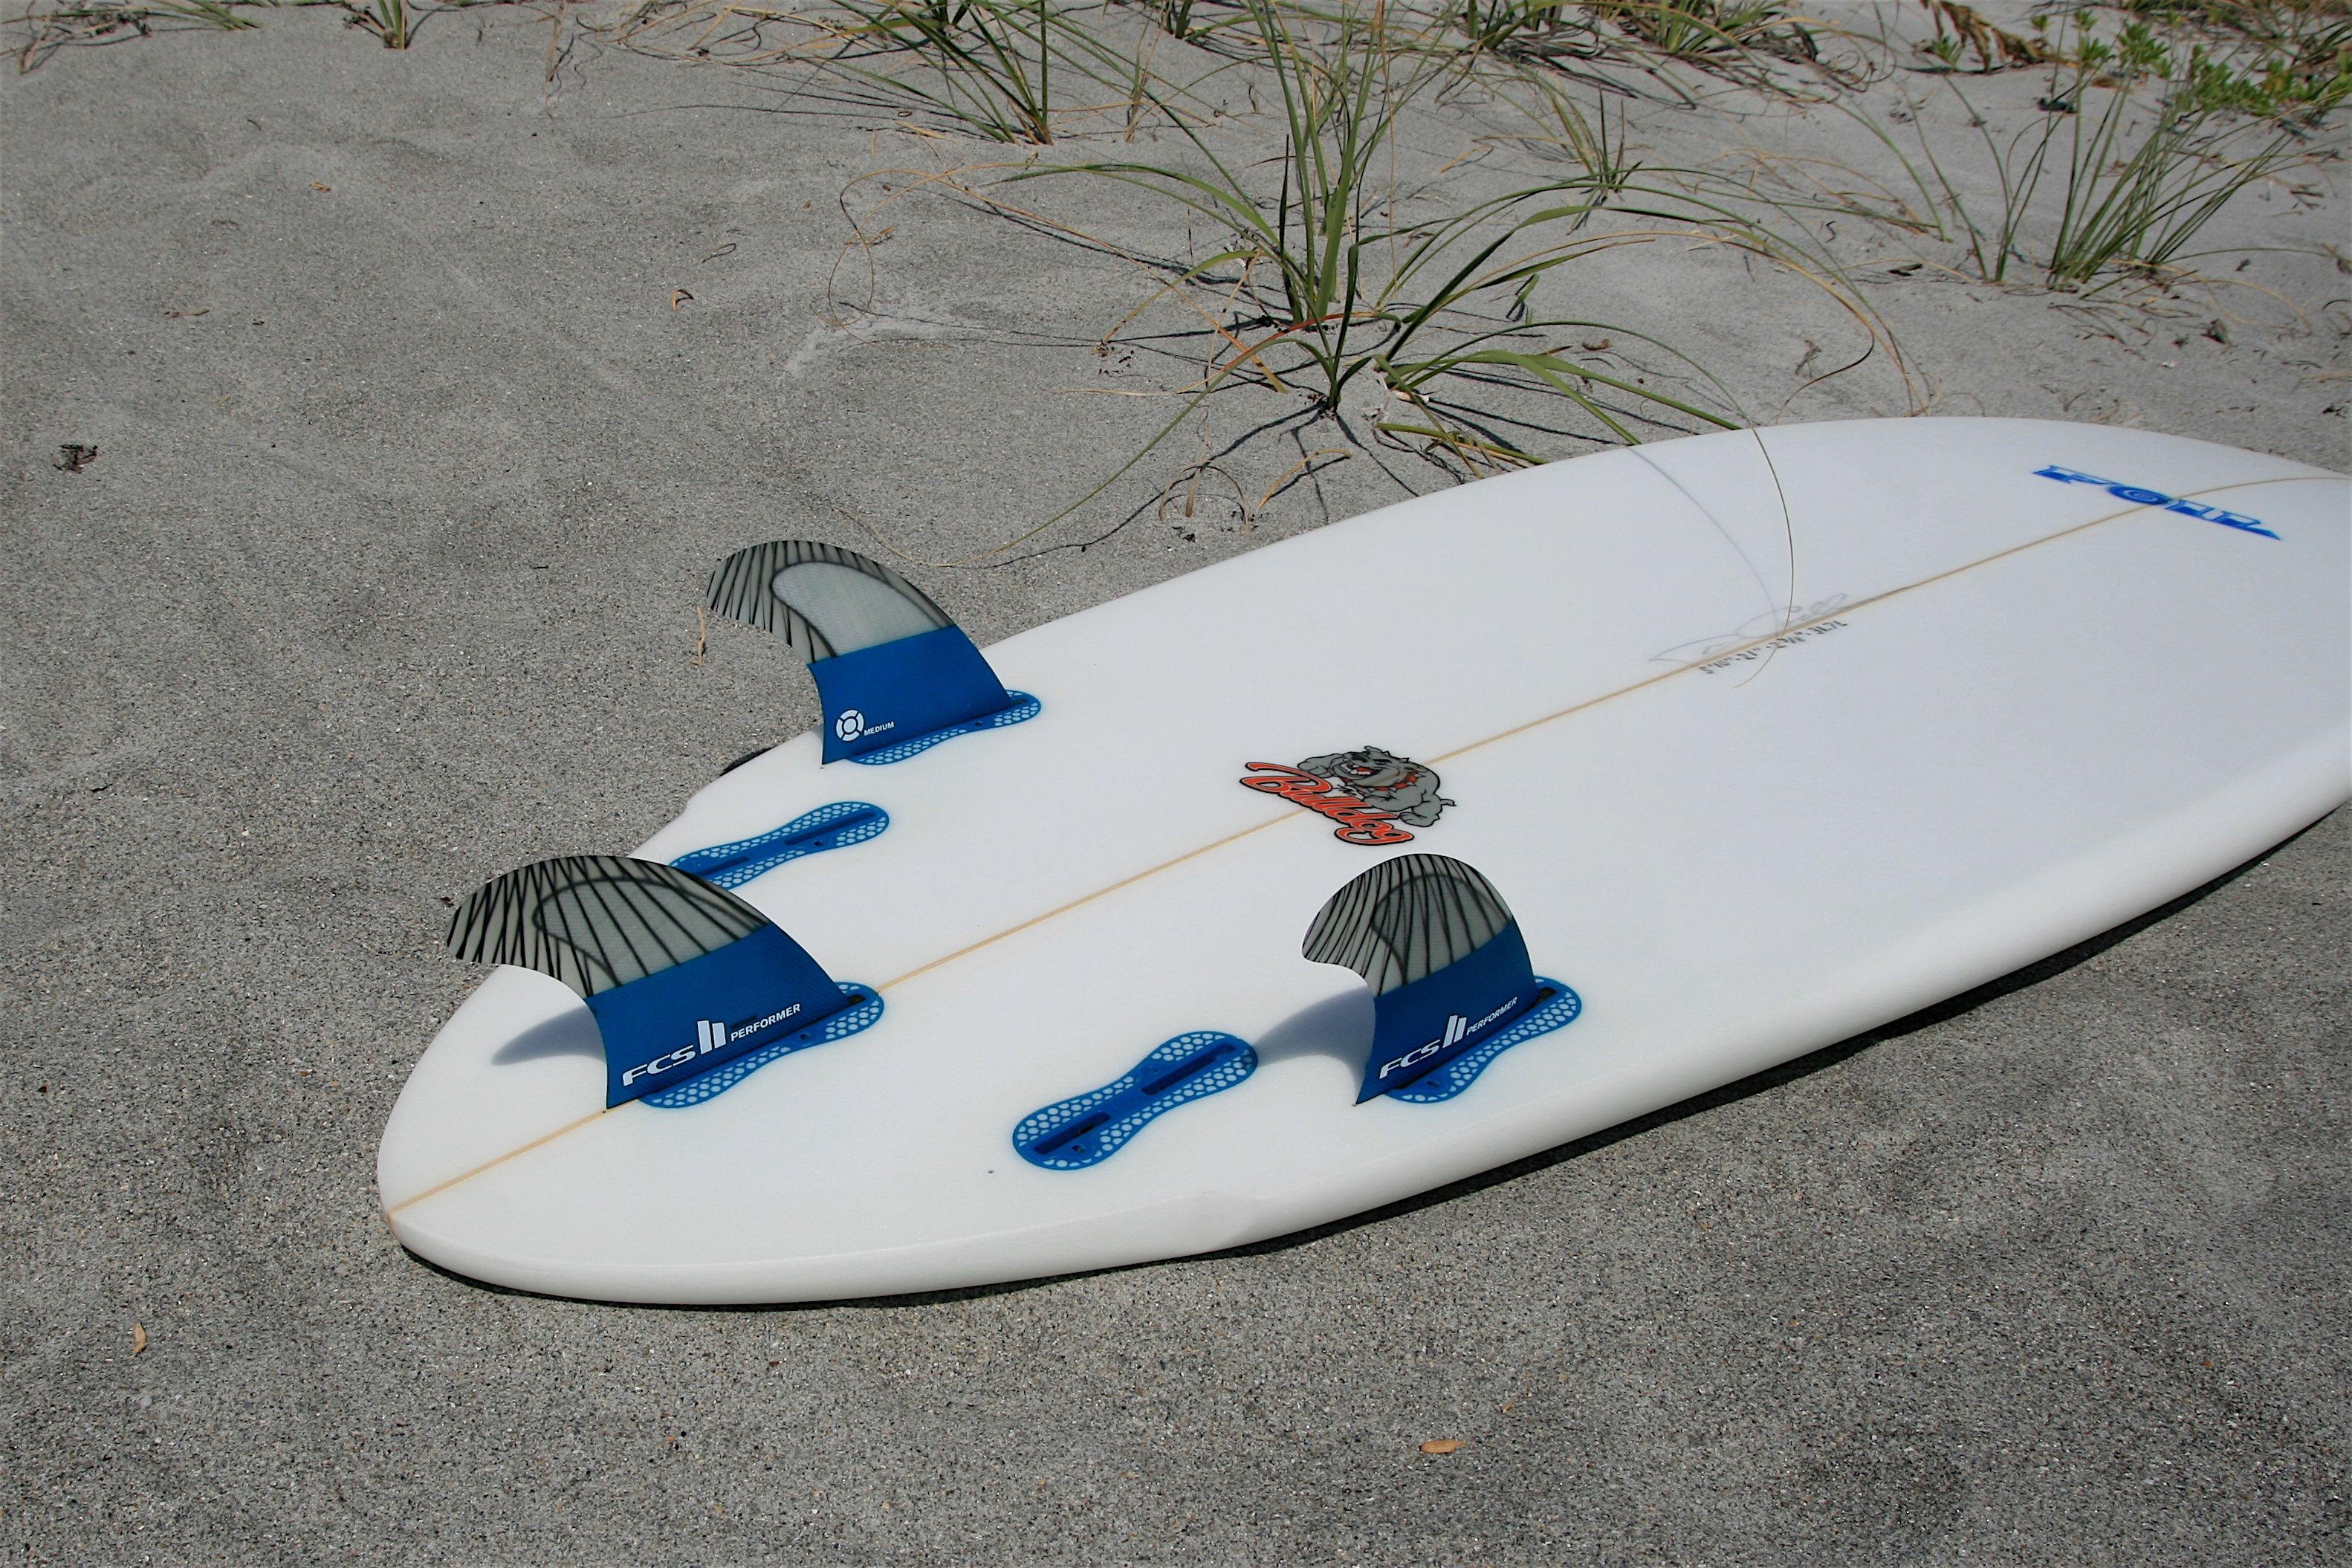 Fcsii Pcc Performers In 6 0 Foil The Bulldog Short Board Surfboard Surf Accessories Cocoa Beach